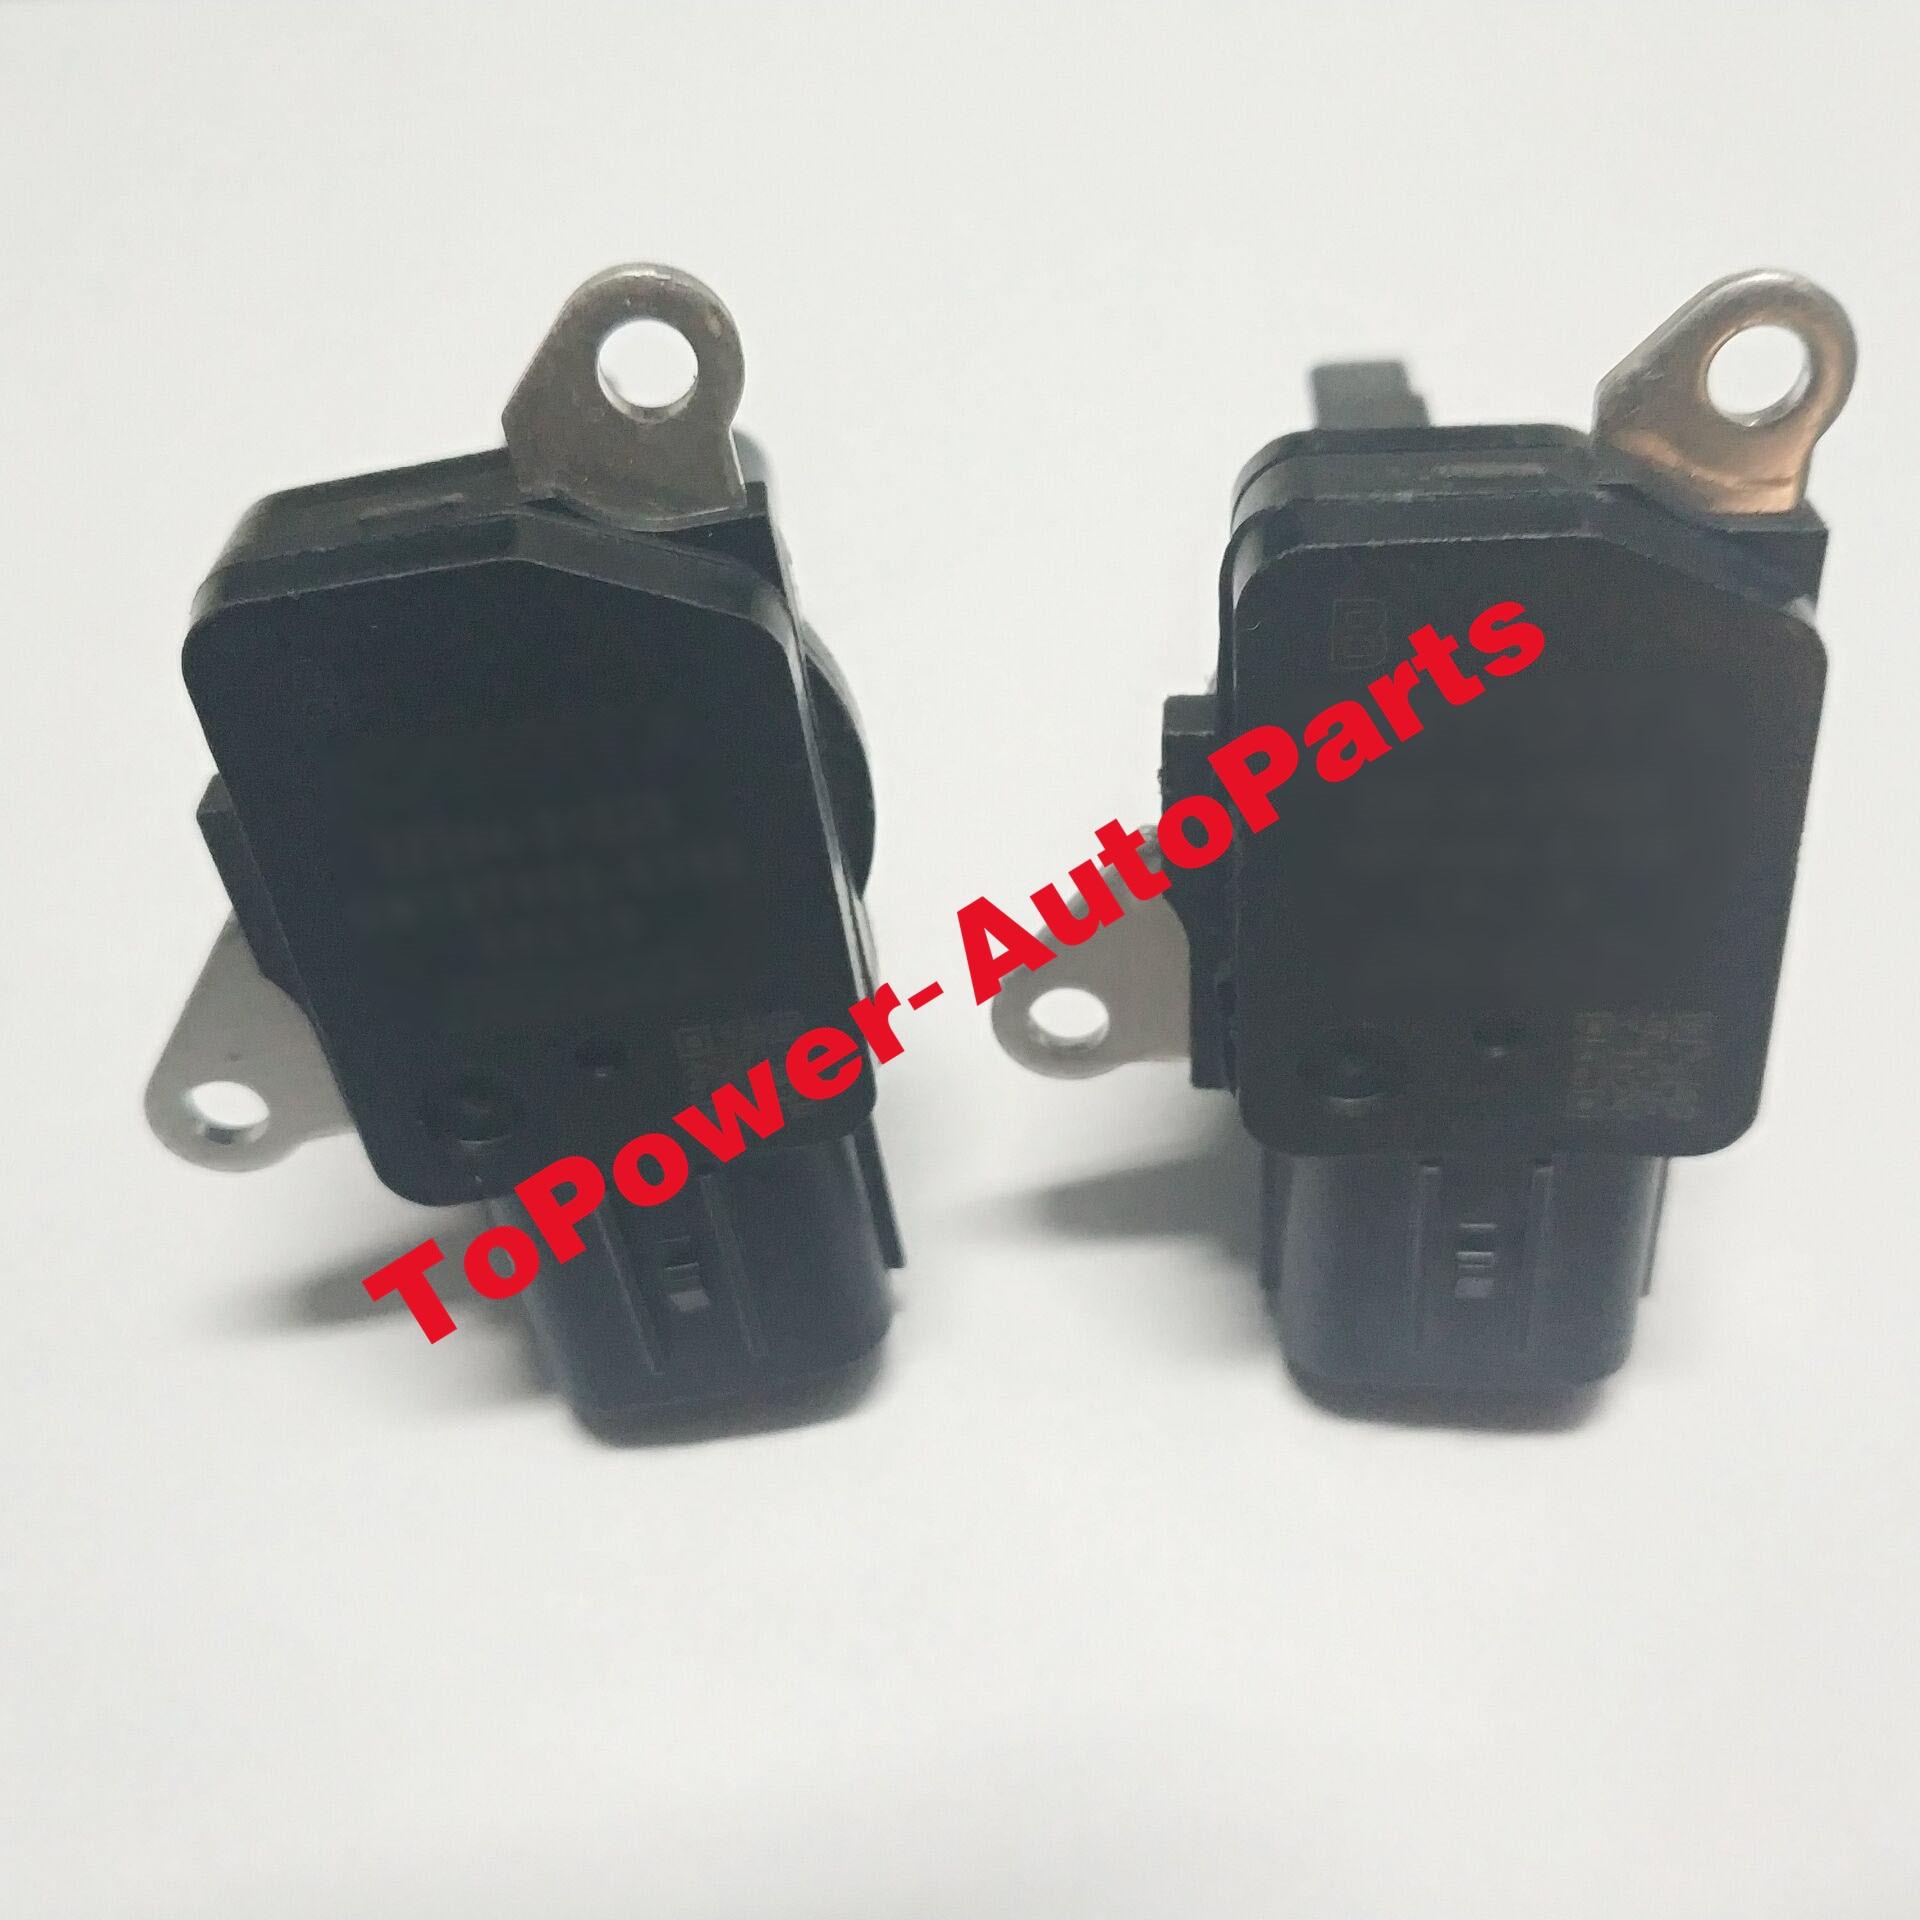 Auto Vervanging Air Flow Meter Maf Sensor 22204-31020/197400-5150 Past Voor Toyo + + Ta Le + + Xus kluger Corolla Tarago 2.4 3.5 1.8